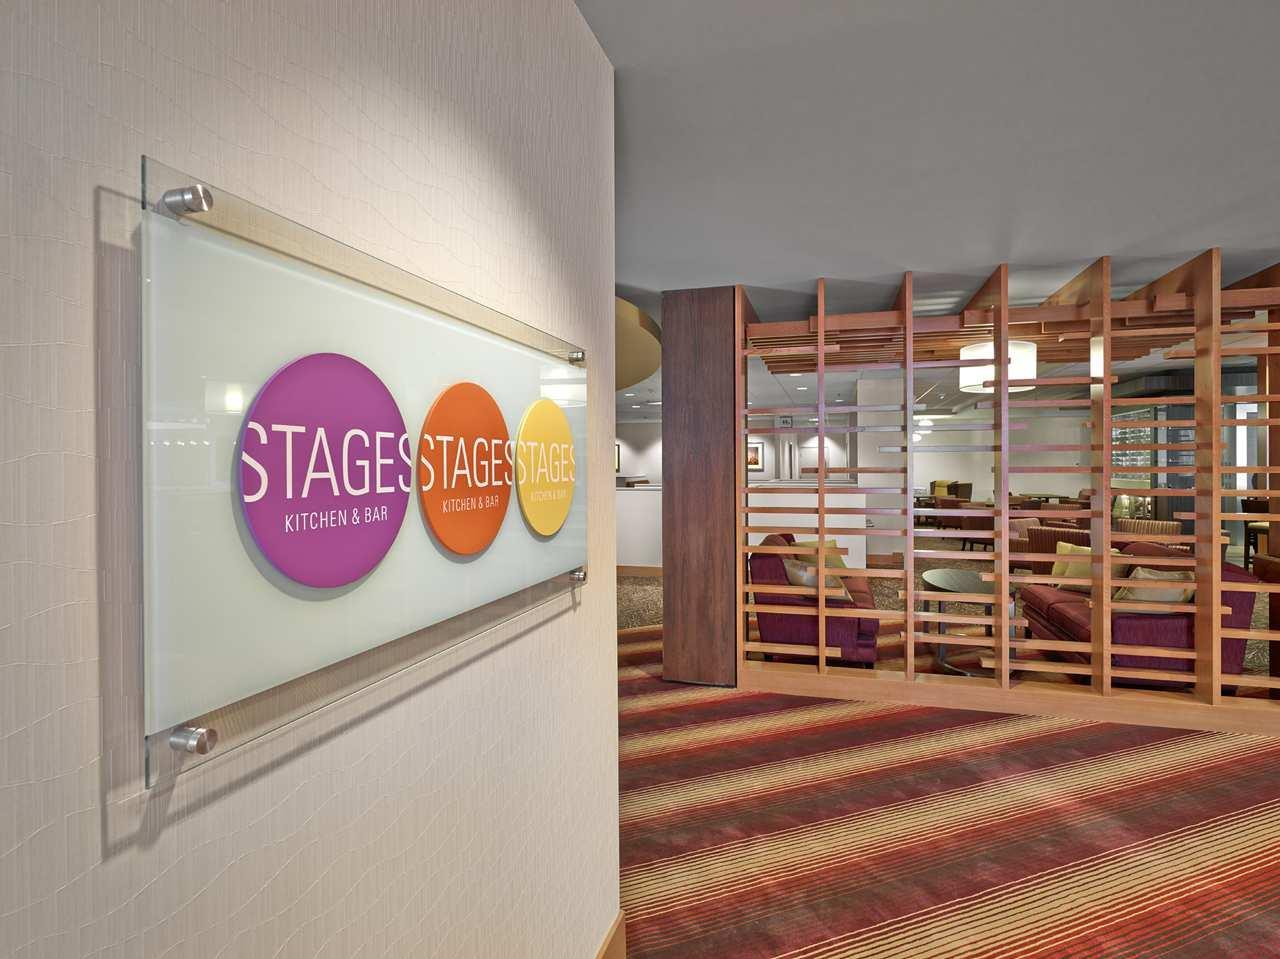 DoubleTree by Hilton Hotel West Edmonton in Edmonton: Stages Kitchen & Bar